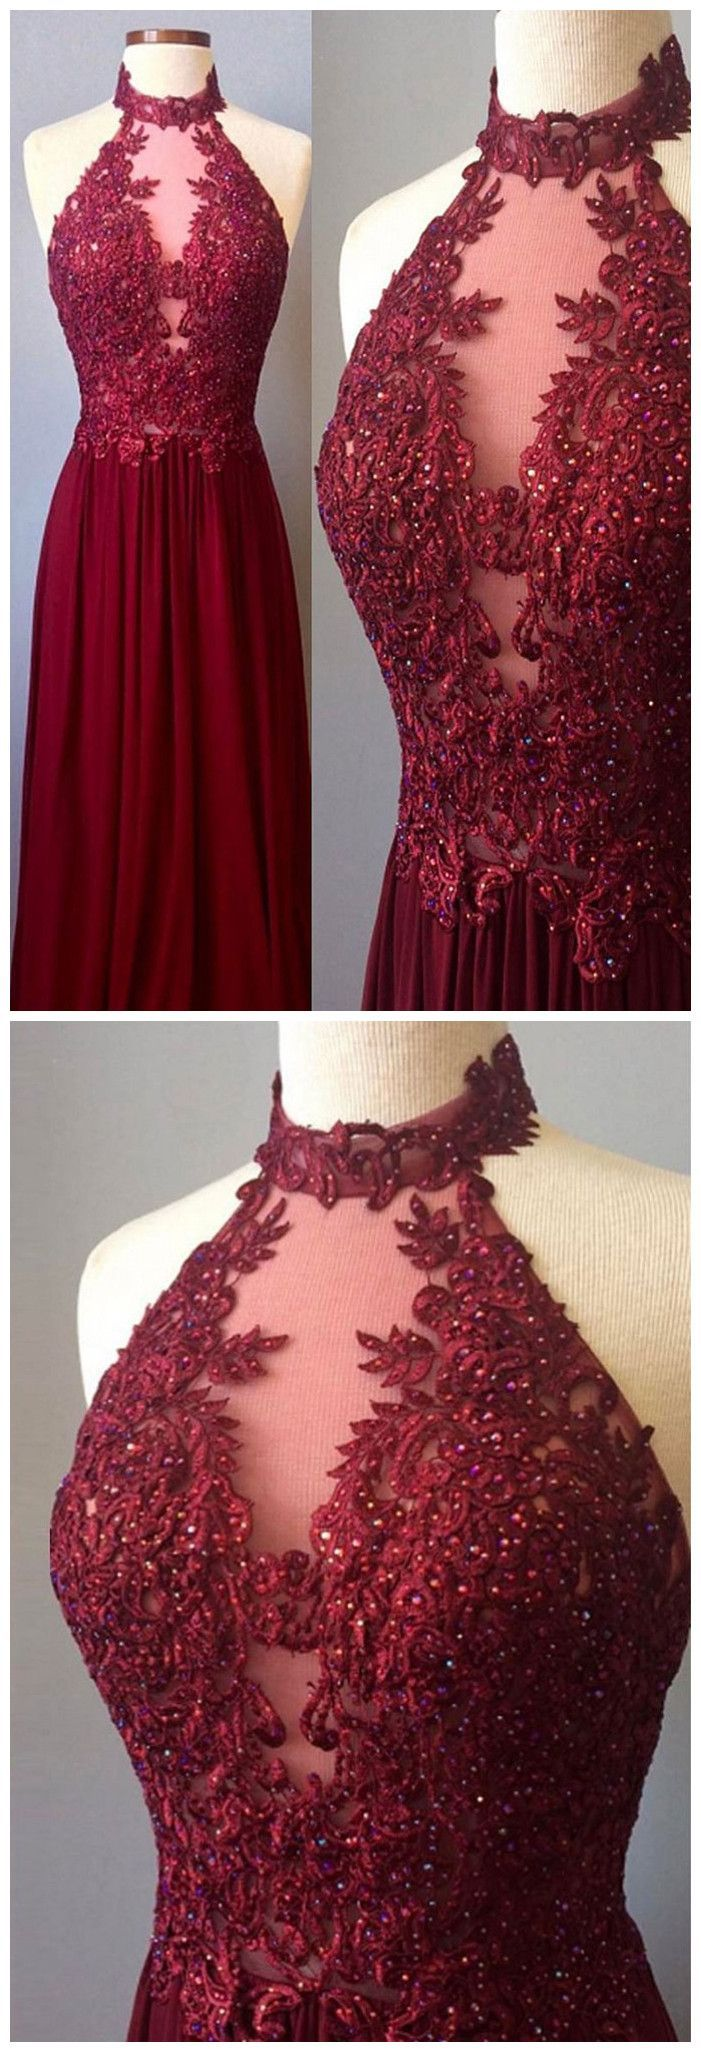 Chic aline high neck chiffon applique burgundy long prom dress